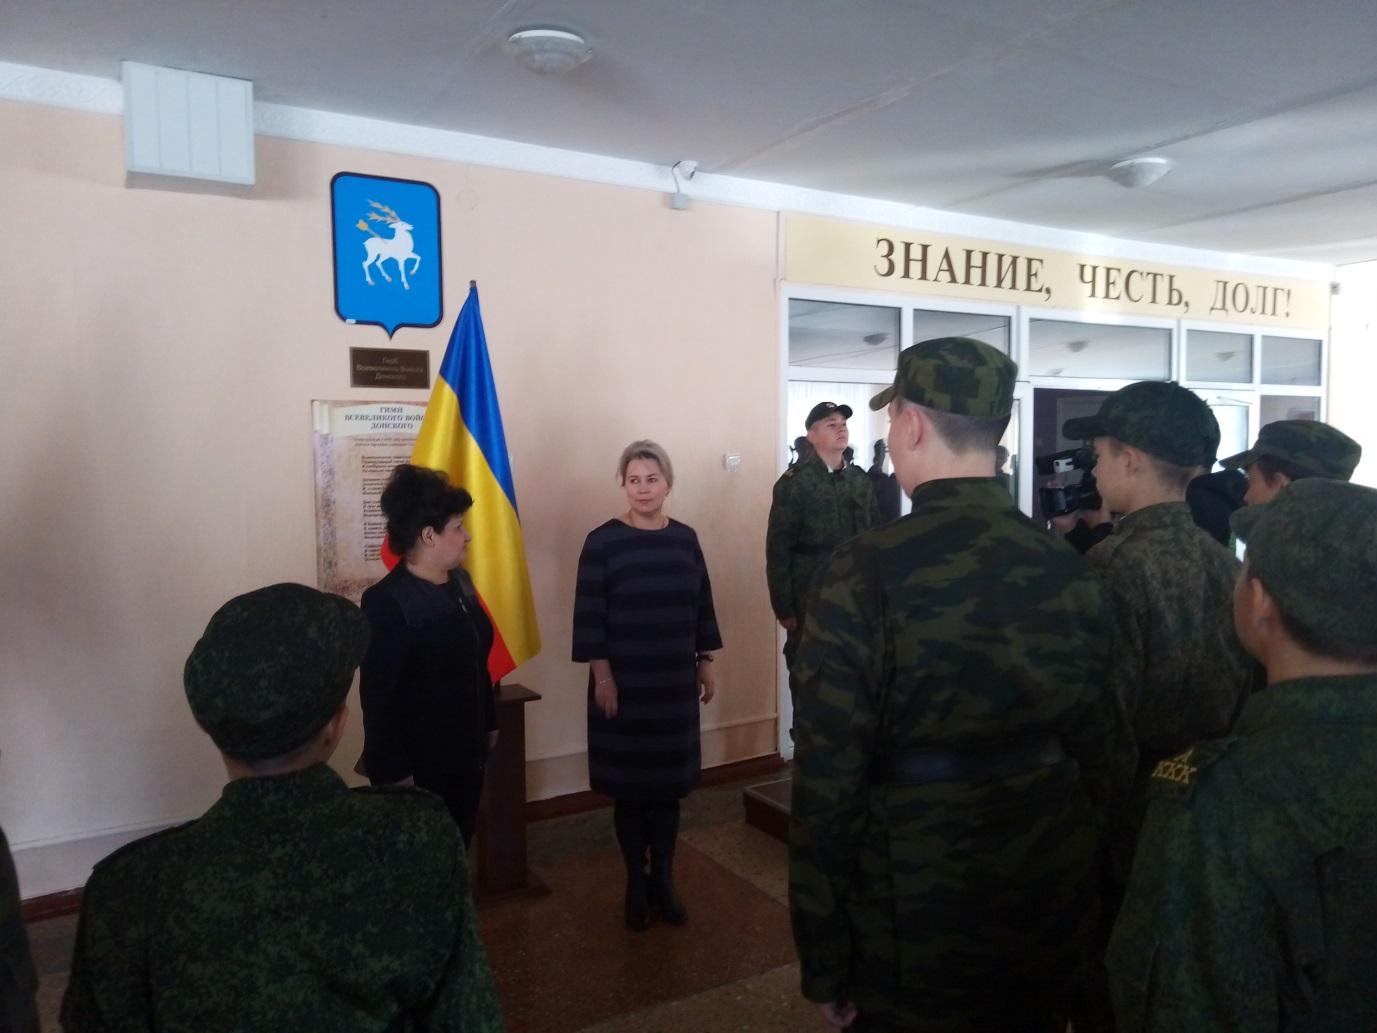 Алчевским кадетам вручили подарок от ОД «Мир Луганщине» 1